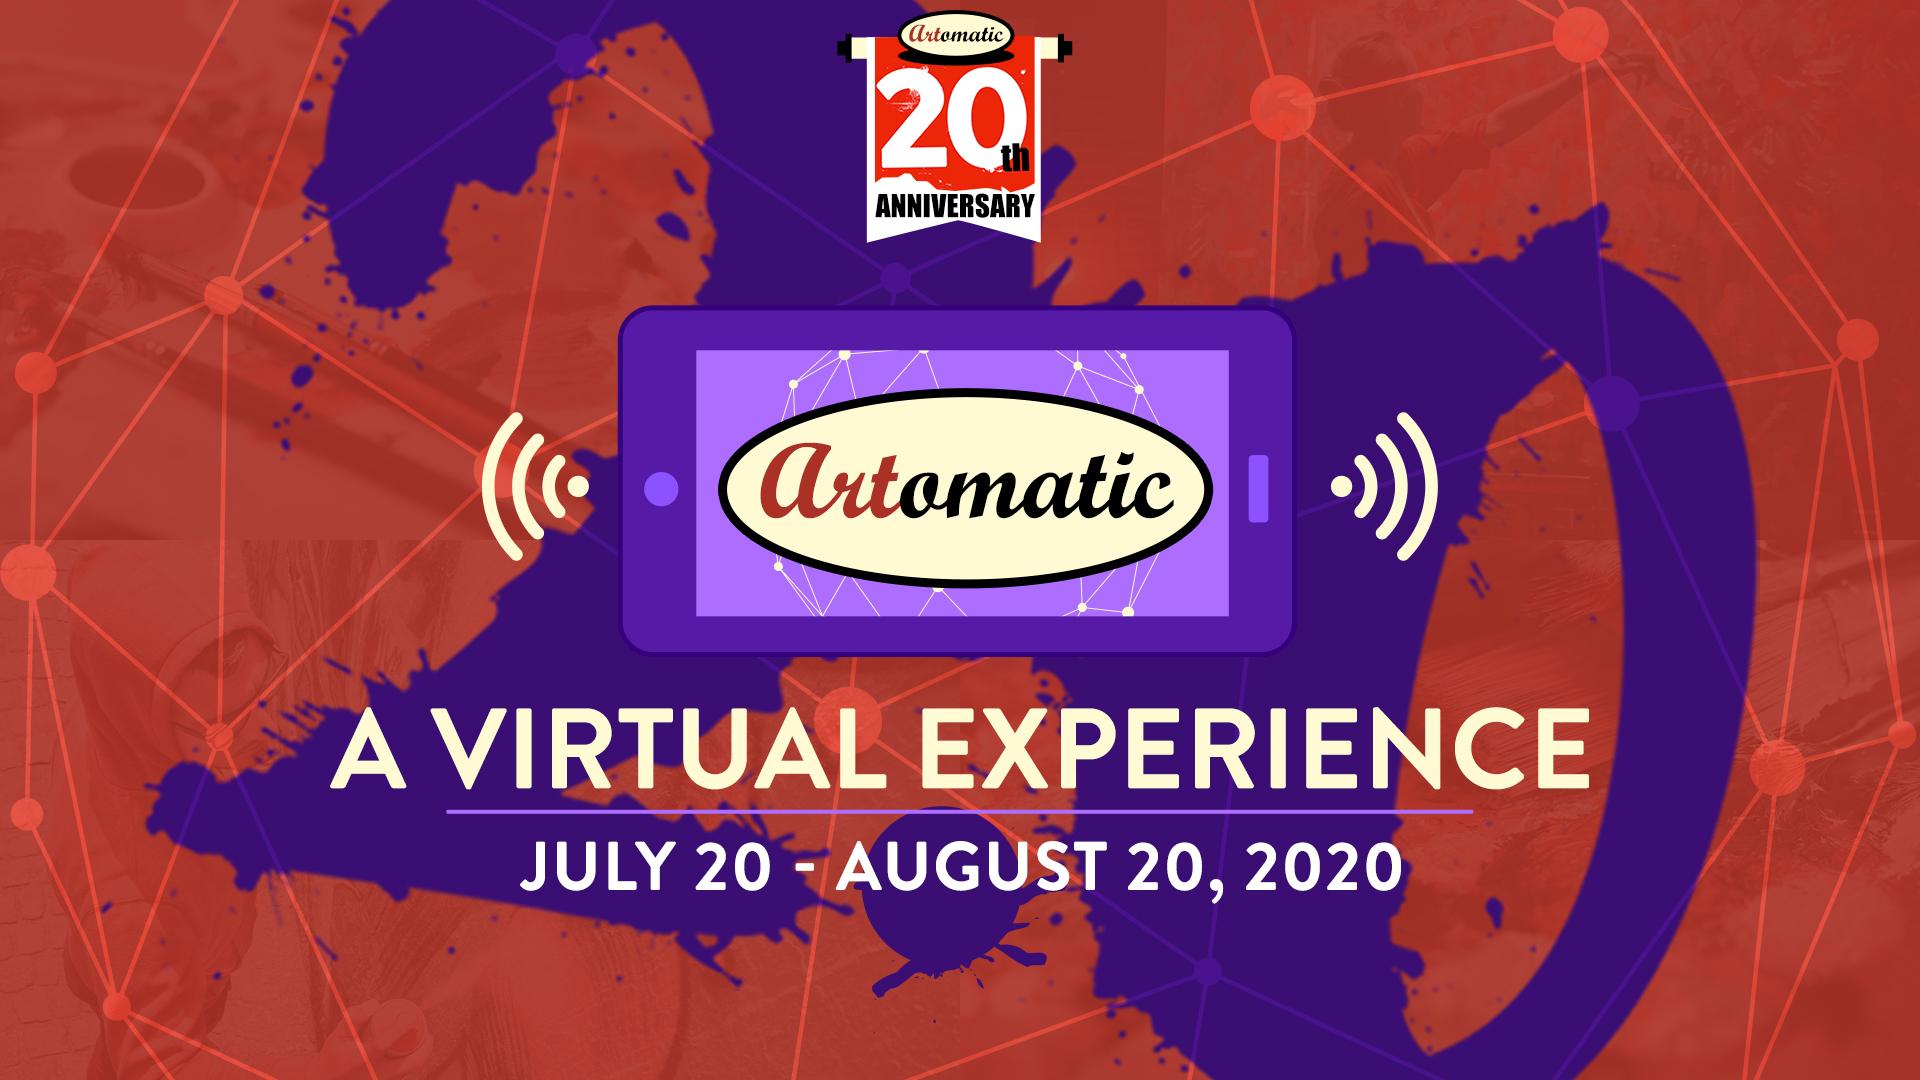 Artomatic 2.0: A Virtual Experience